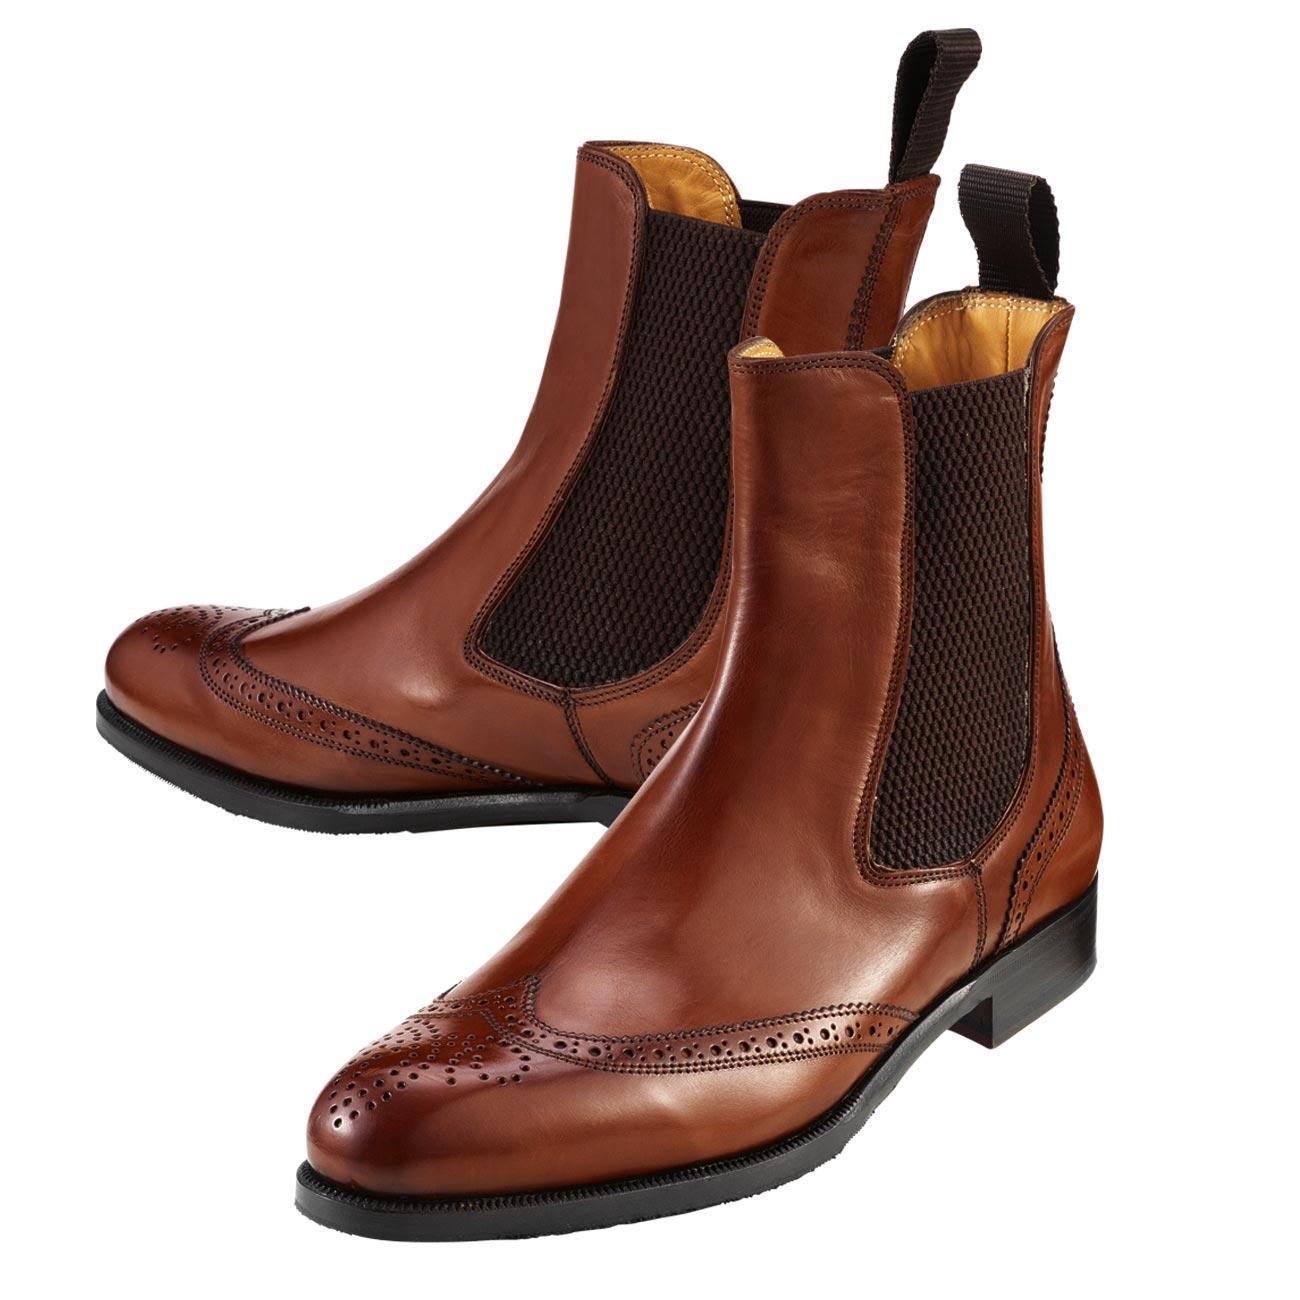 Fratelli borgioli chelsea boot the immortal chelsea boot made in